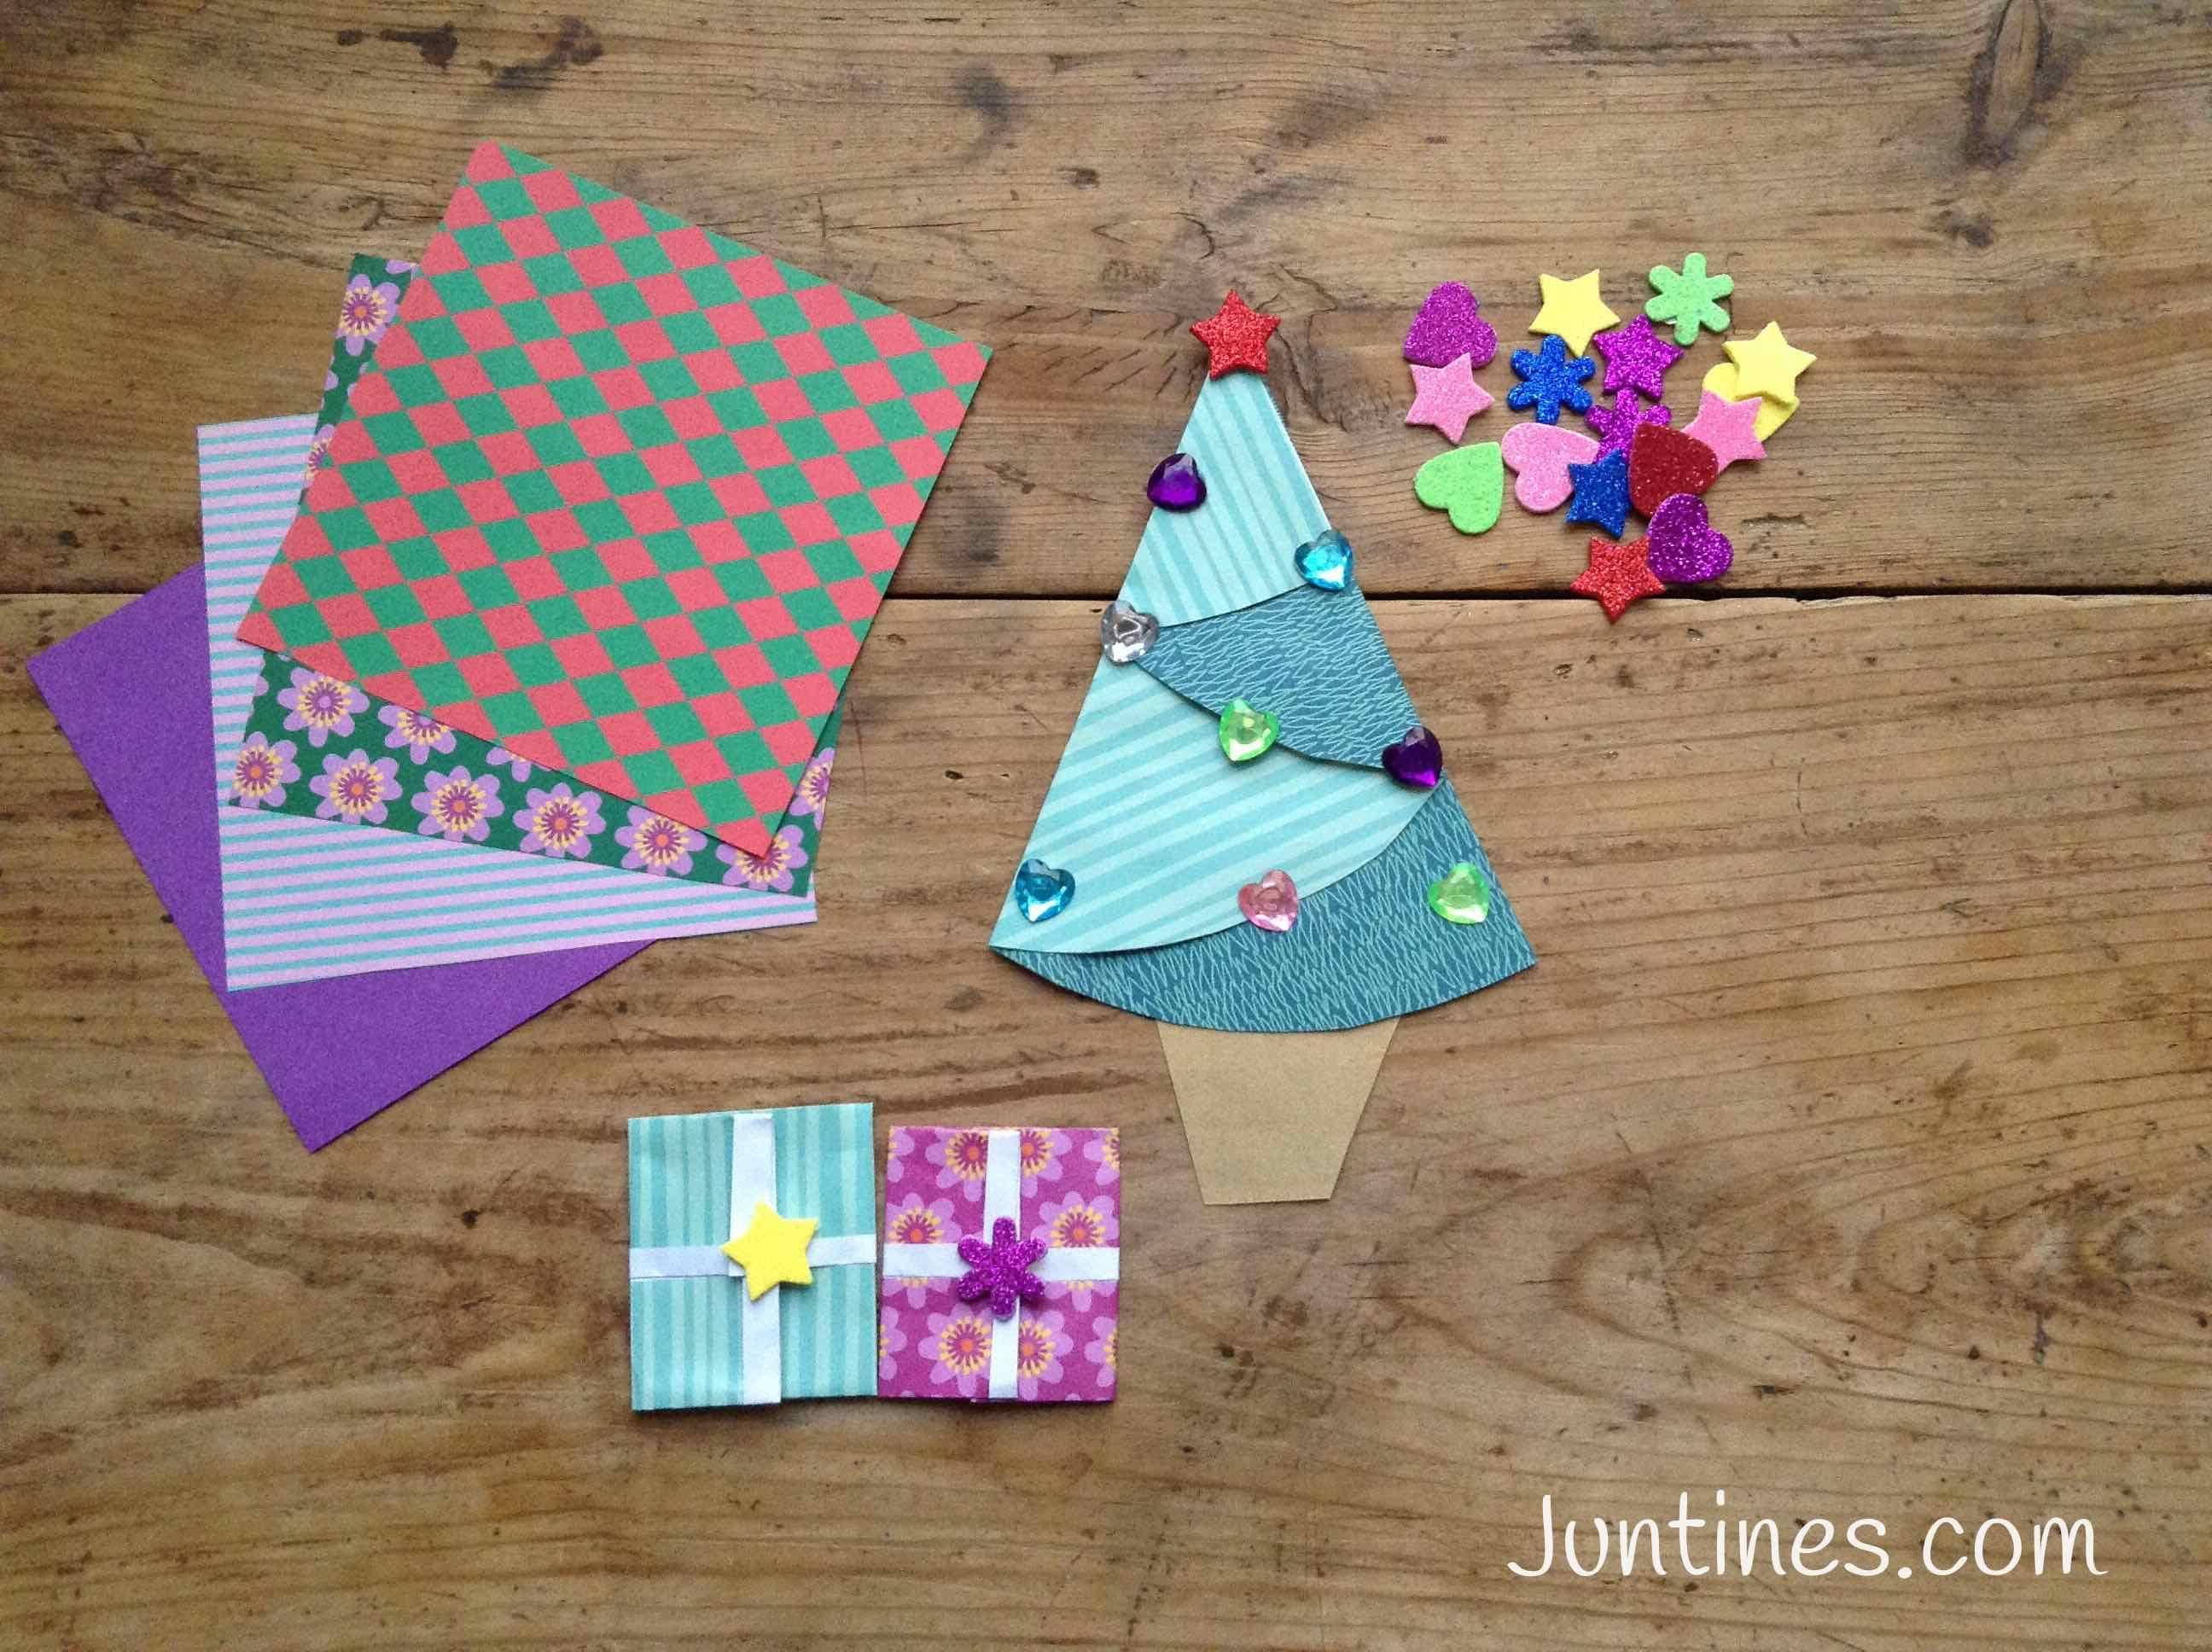 Rbol de navidad navidades juntines christmas origami for Adornos navidenos origami paso a paso